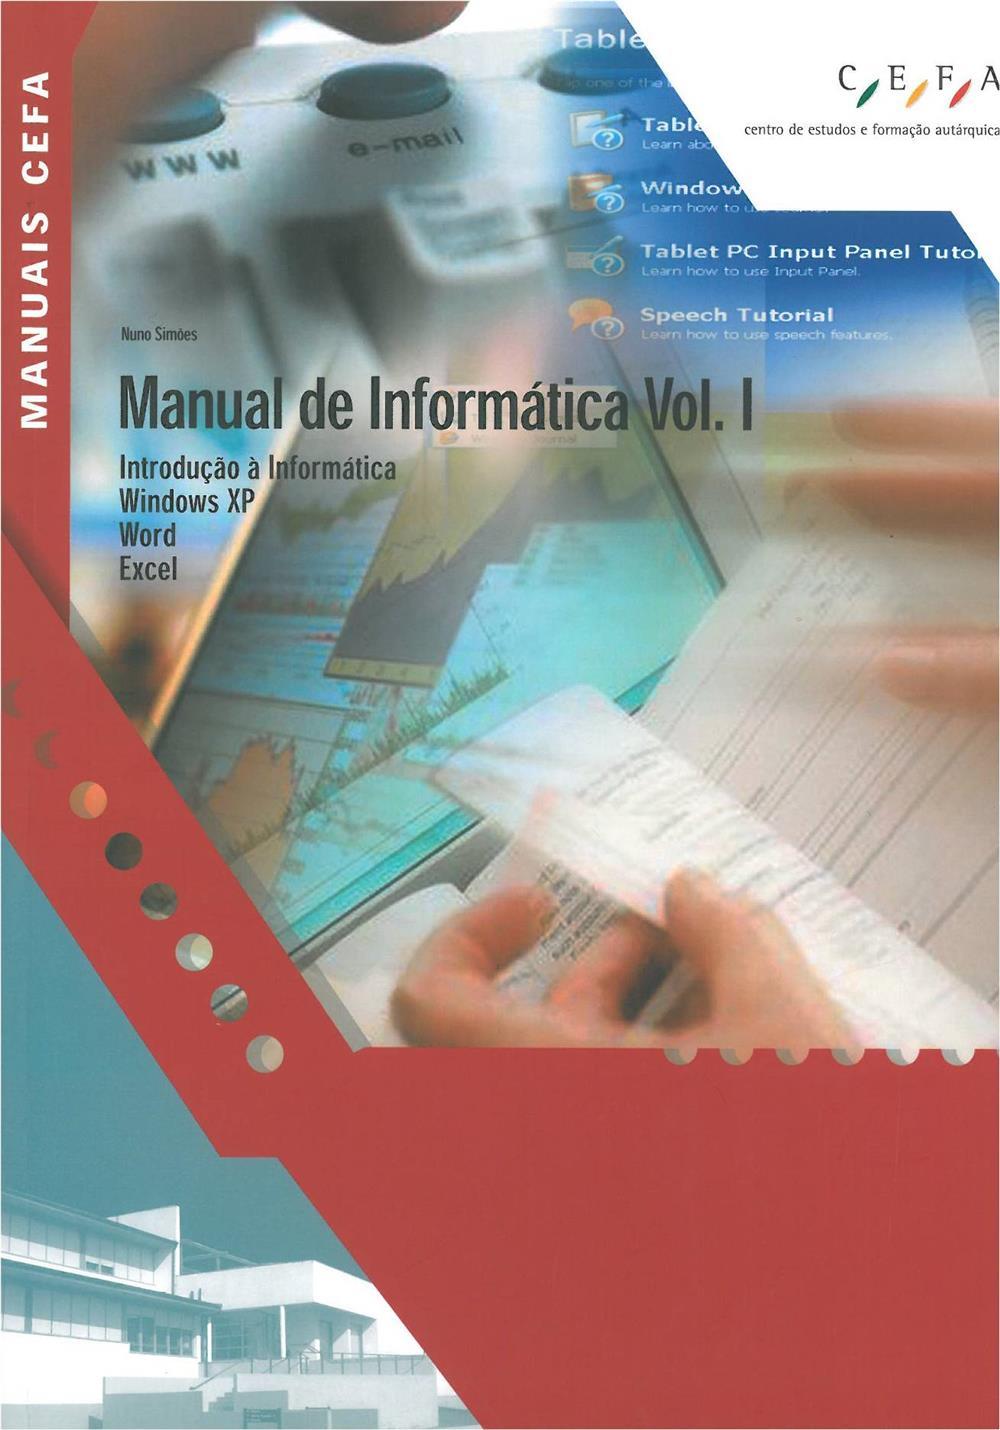 Manual de informática_.jpg